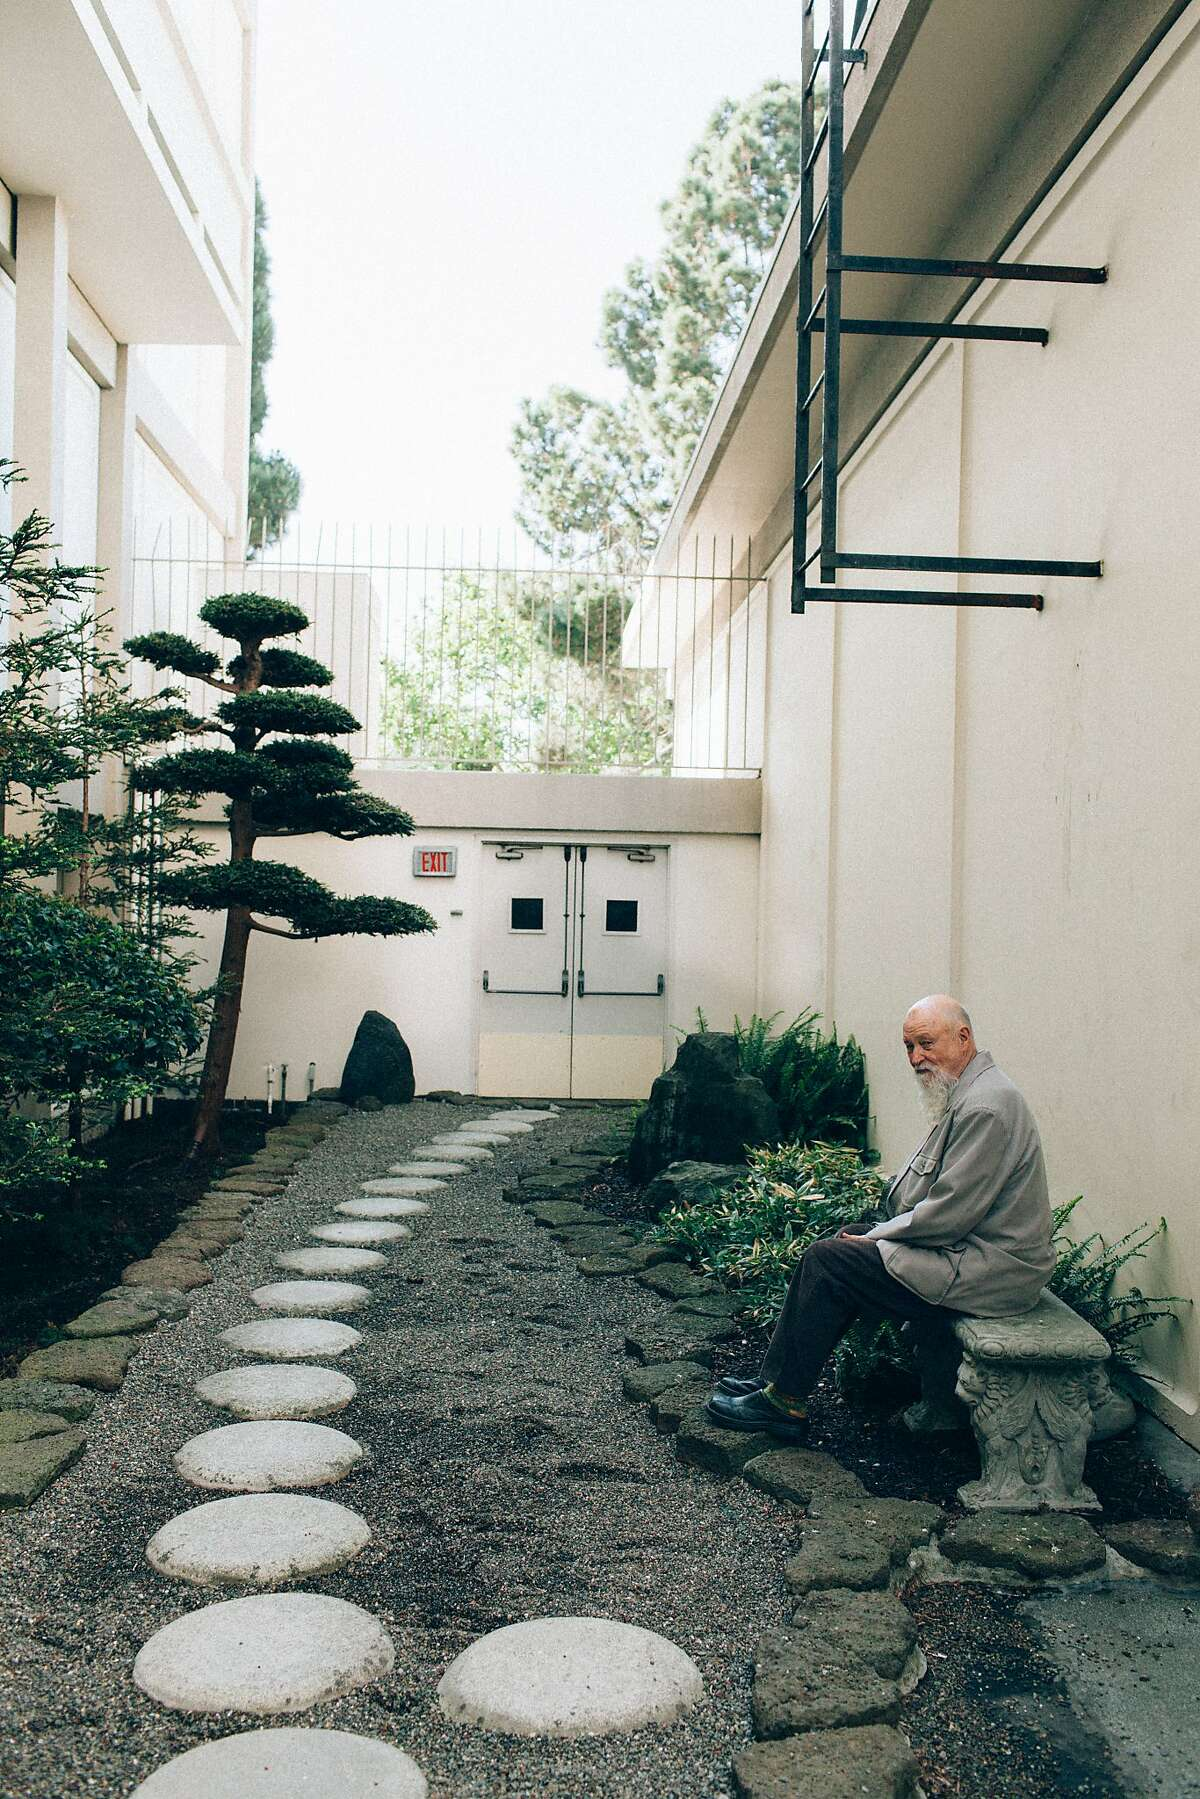 Terry Riley, a pioneer minimalist composer, at the Kabuki hotel, San Francisco, Calif., May 1, 2015.